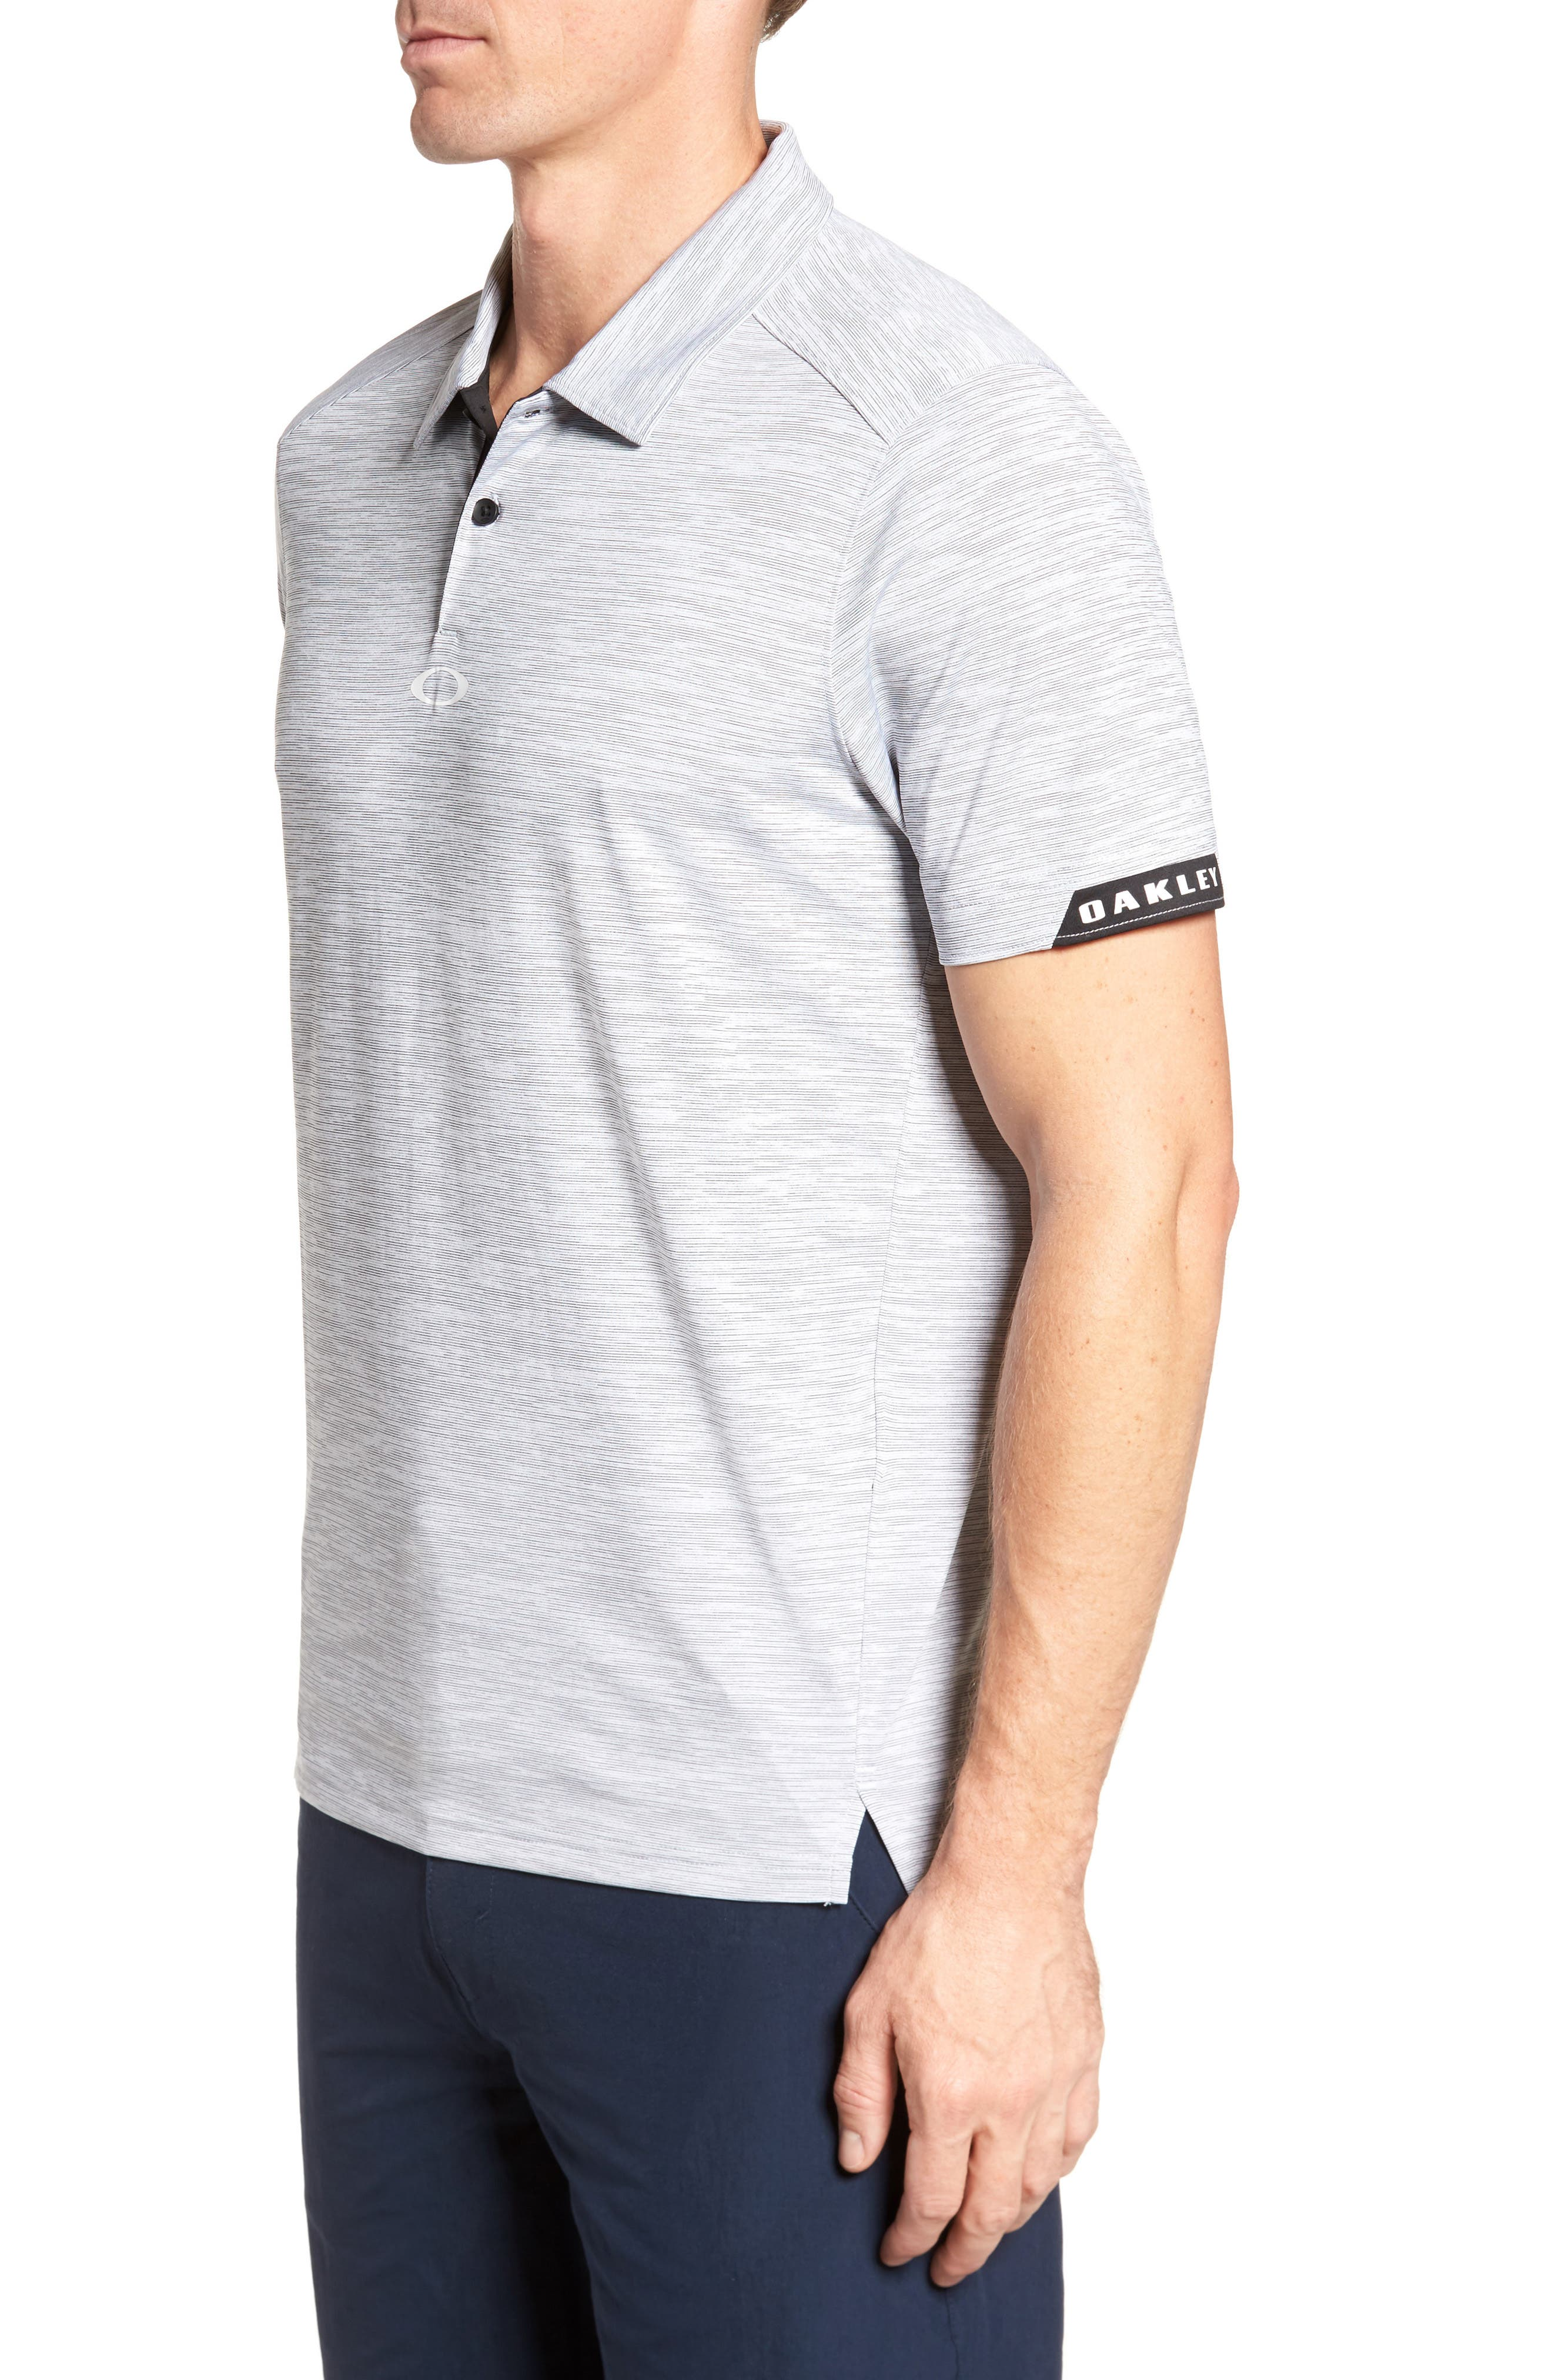 Gravity Polo Shirt,                             Alternate thumbnail 3, color,                             BLACKOUT